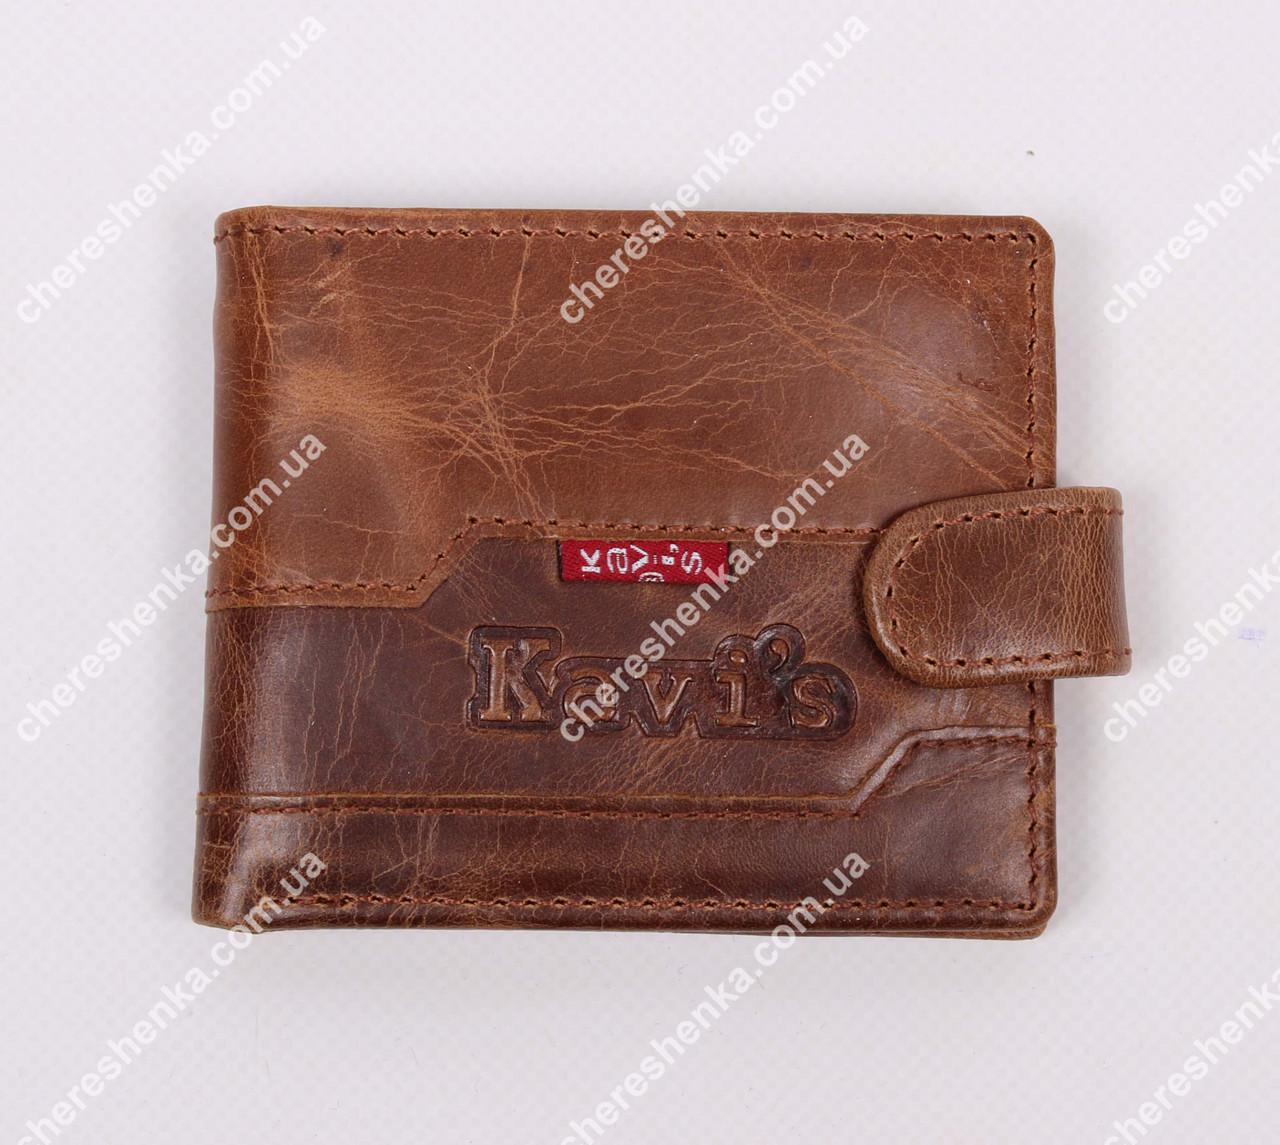 Кошелек кожаный Kavi's 8321 1